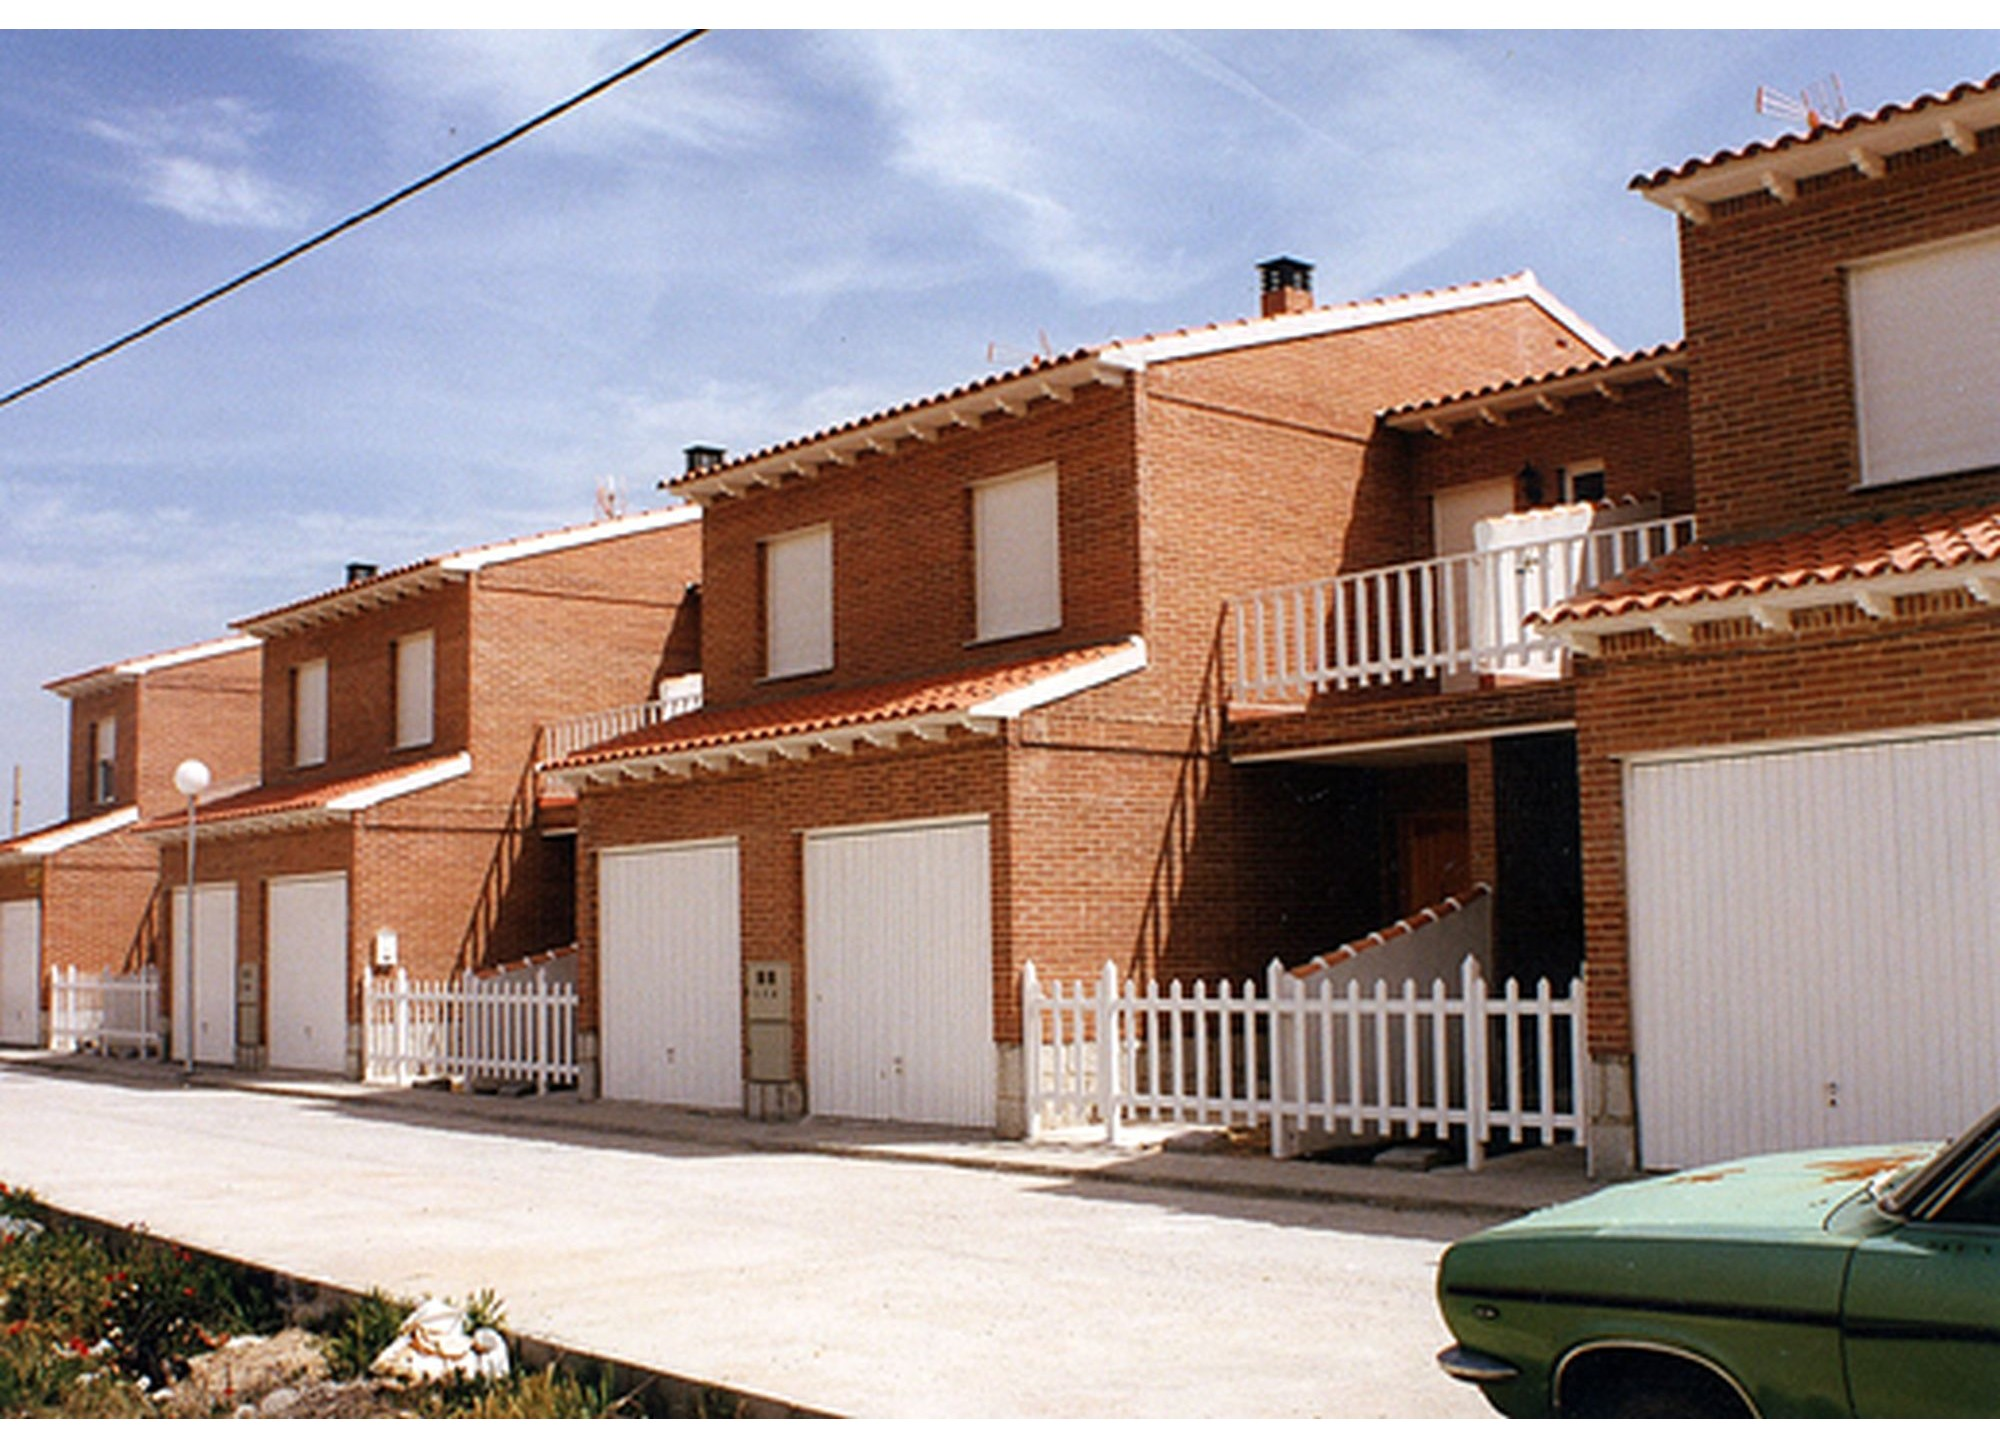 Calle Joan Miró, Chalets calle Joan Miró (Toledo)